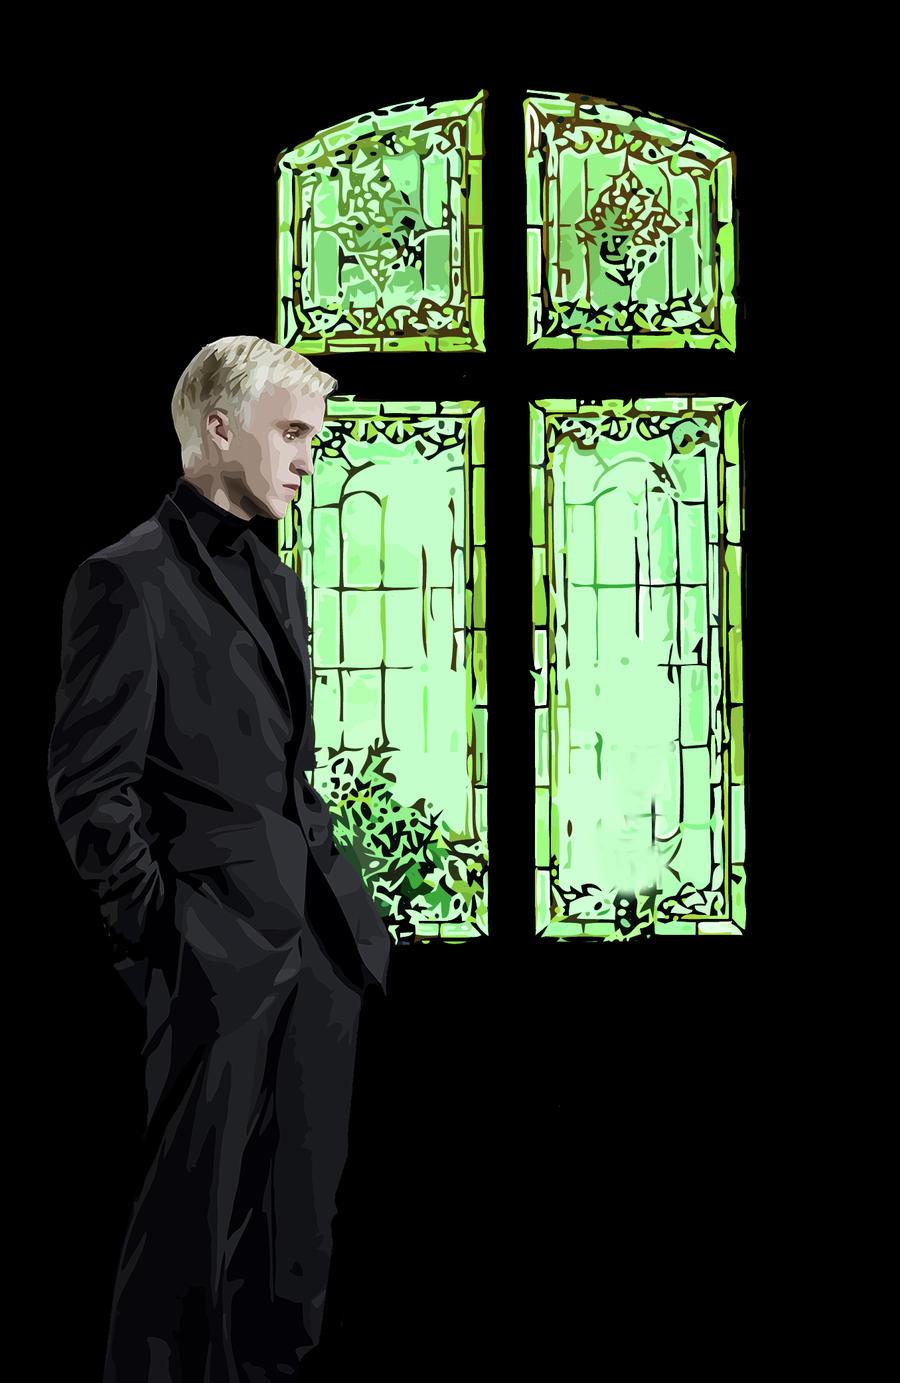 Draco Malfoy at Malfoy Manor by skullpel